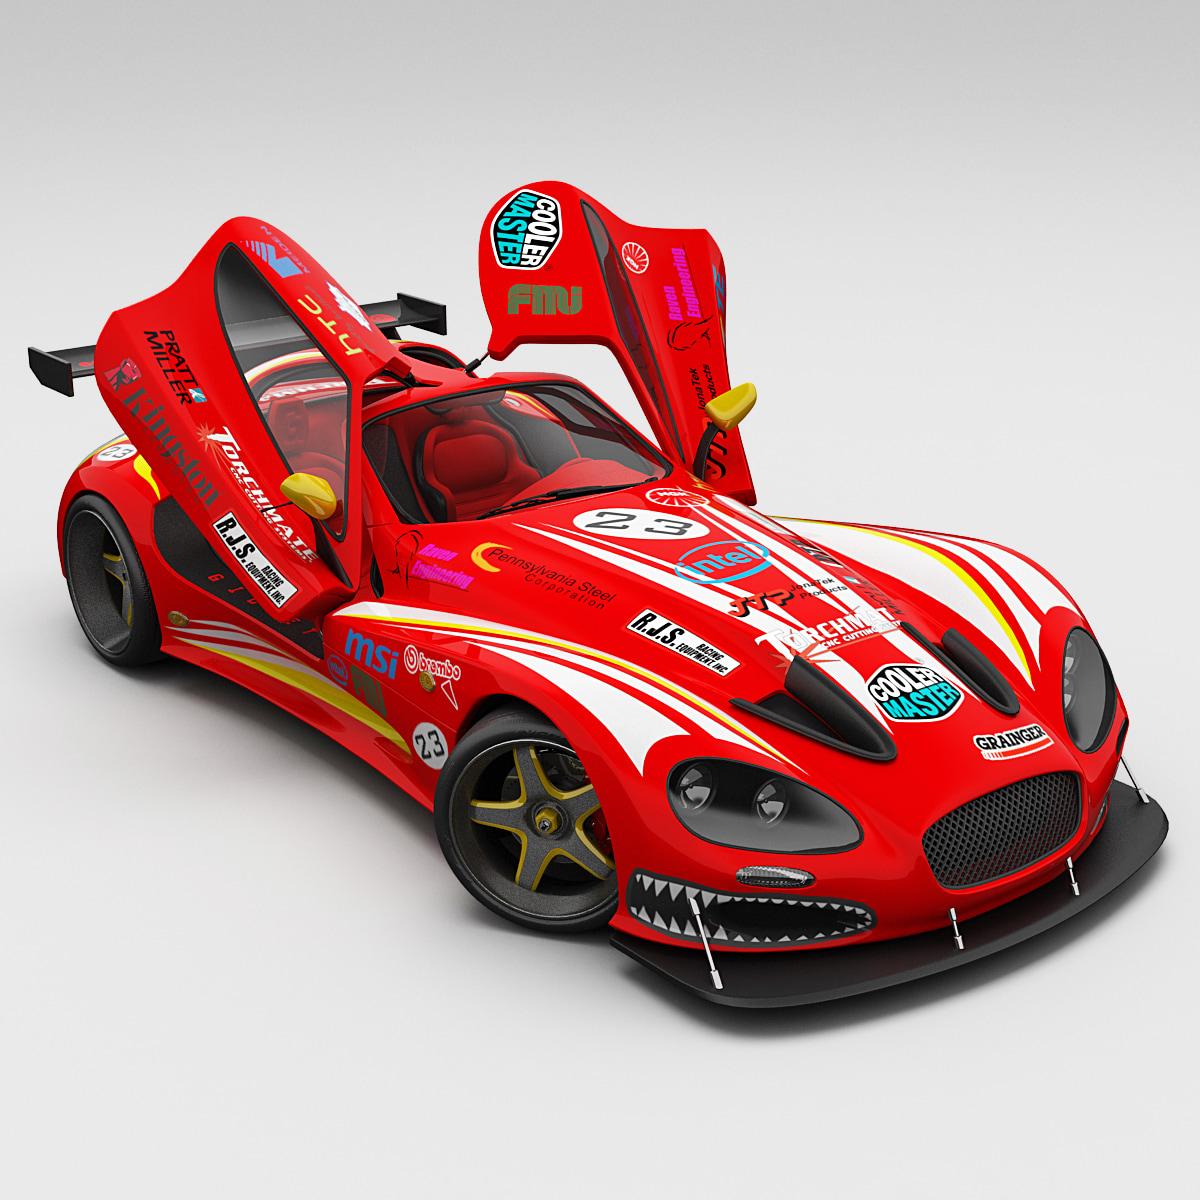 Race_Car_Gillet_Vertigo_Rigged_0000.jpg